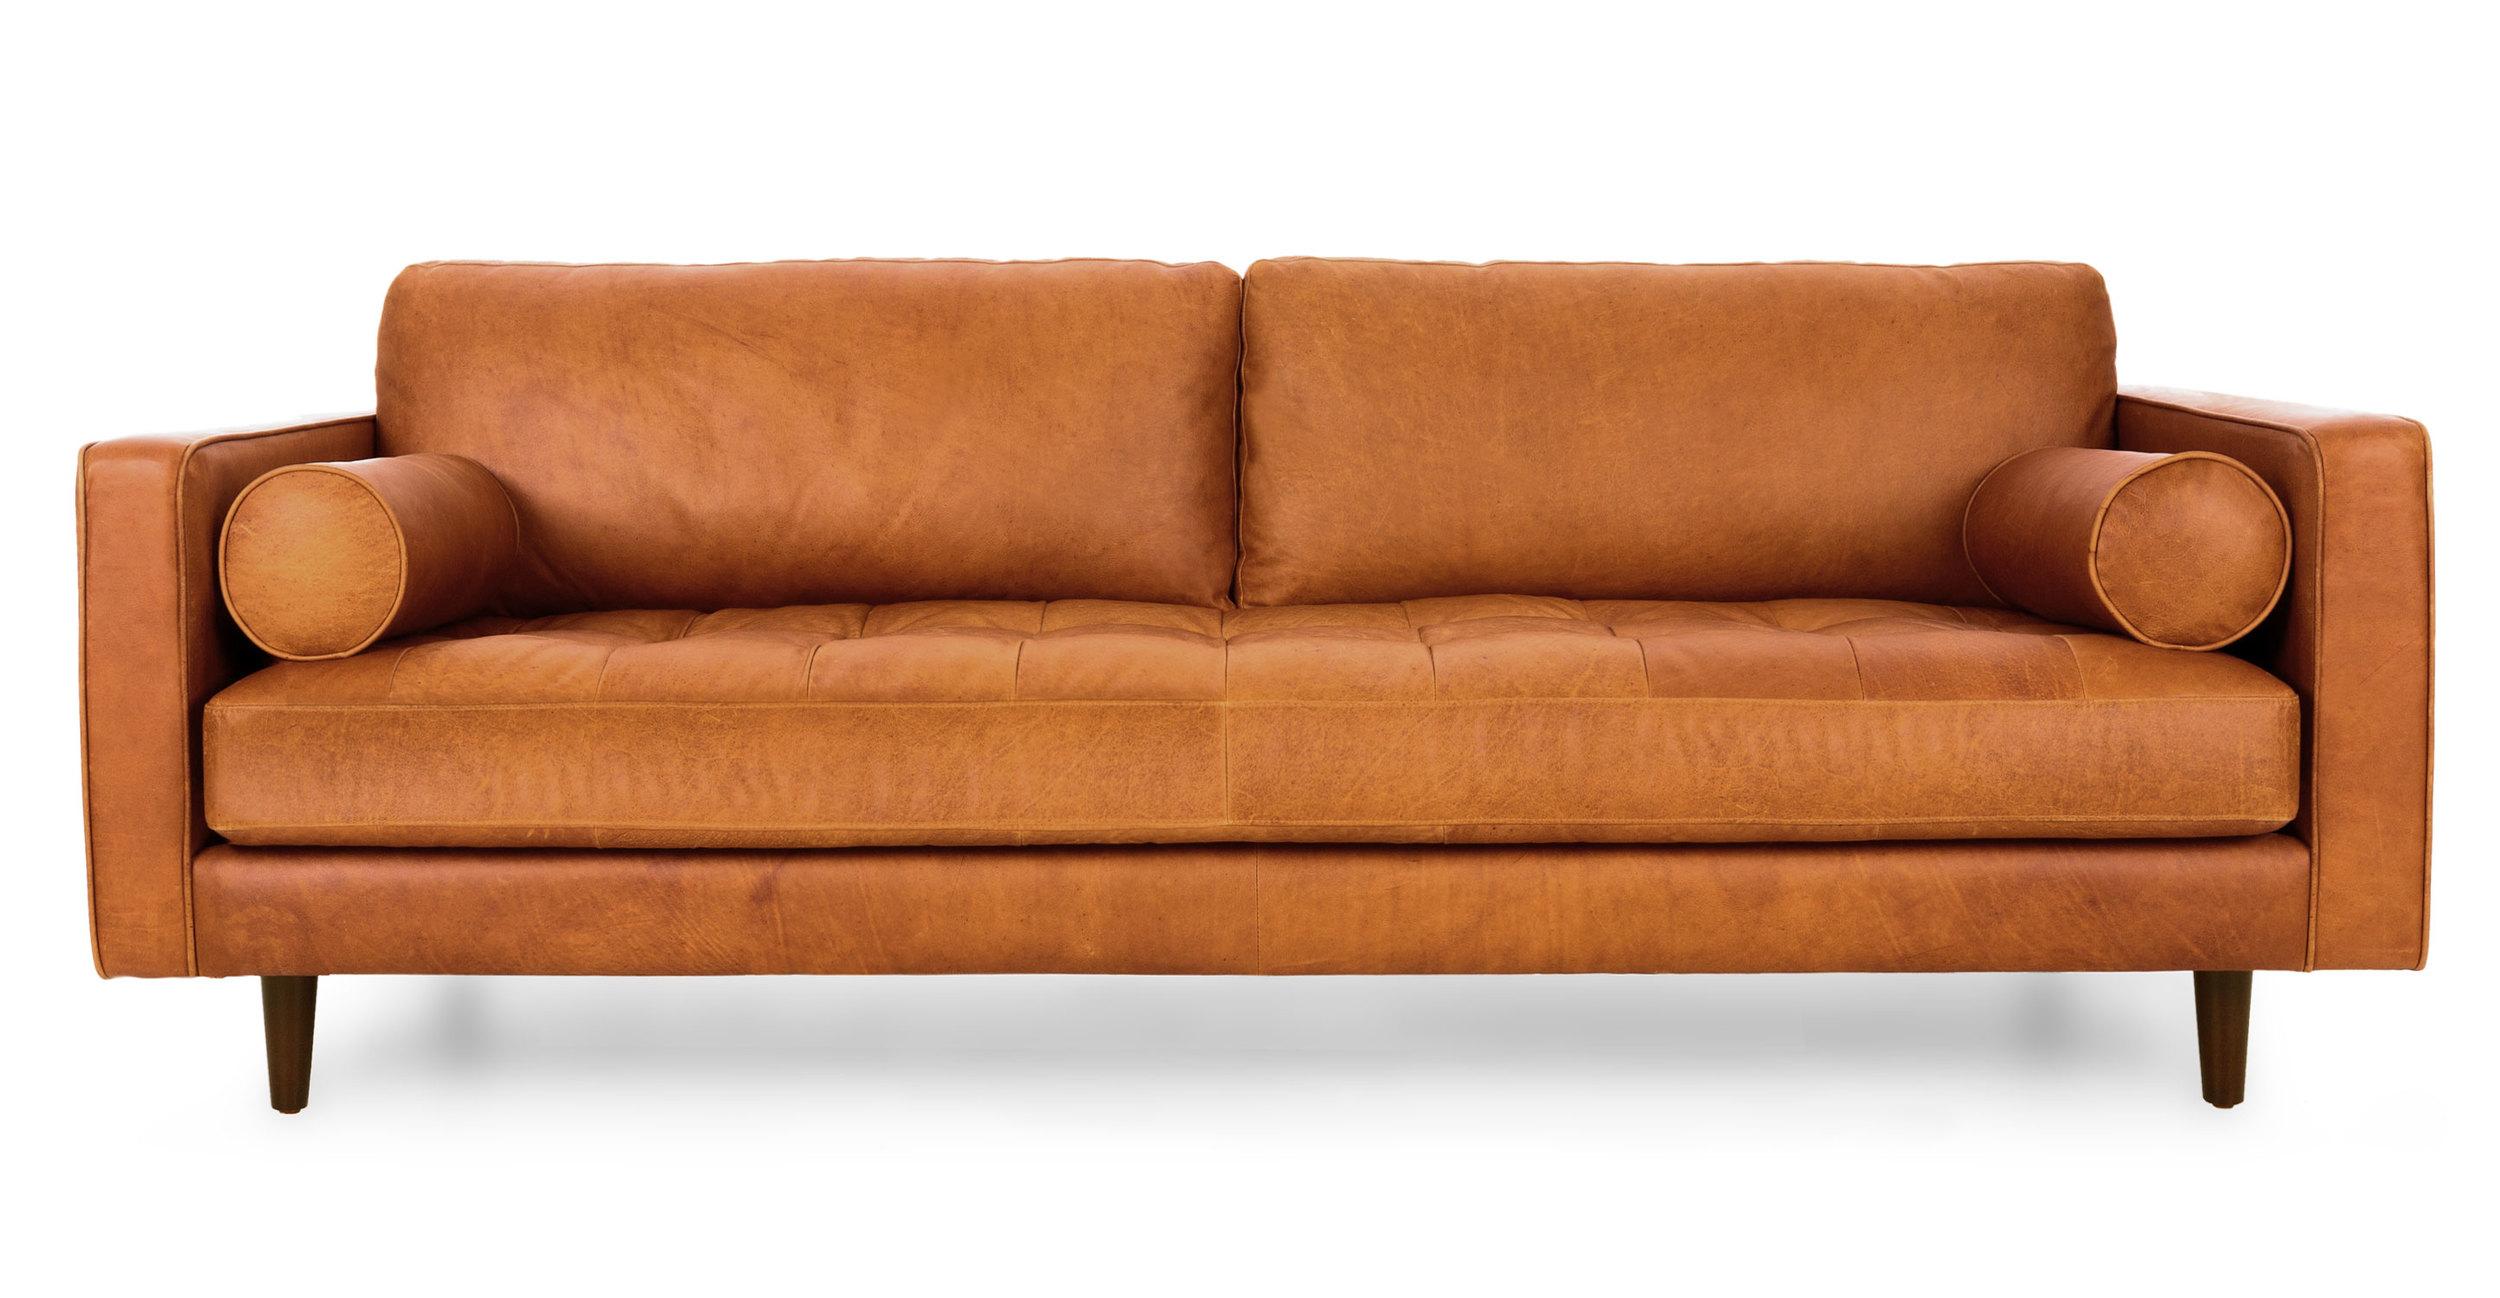 bryght-sven-sofa.jpg